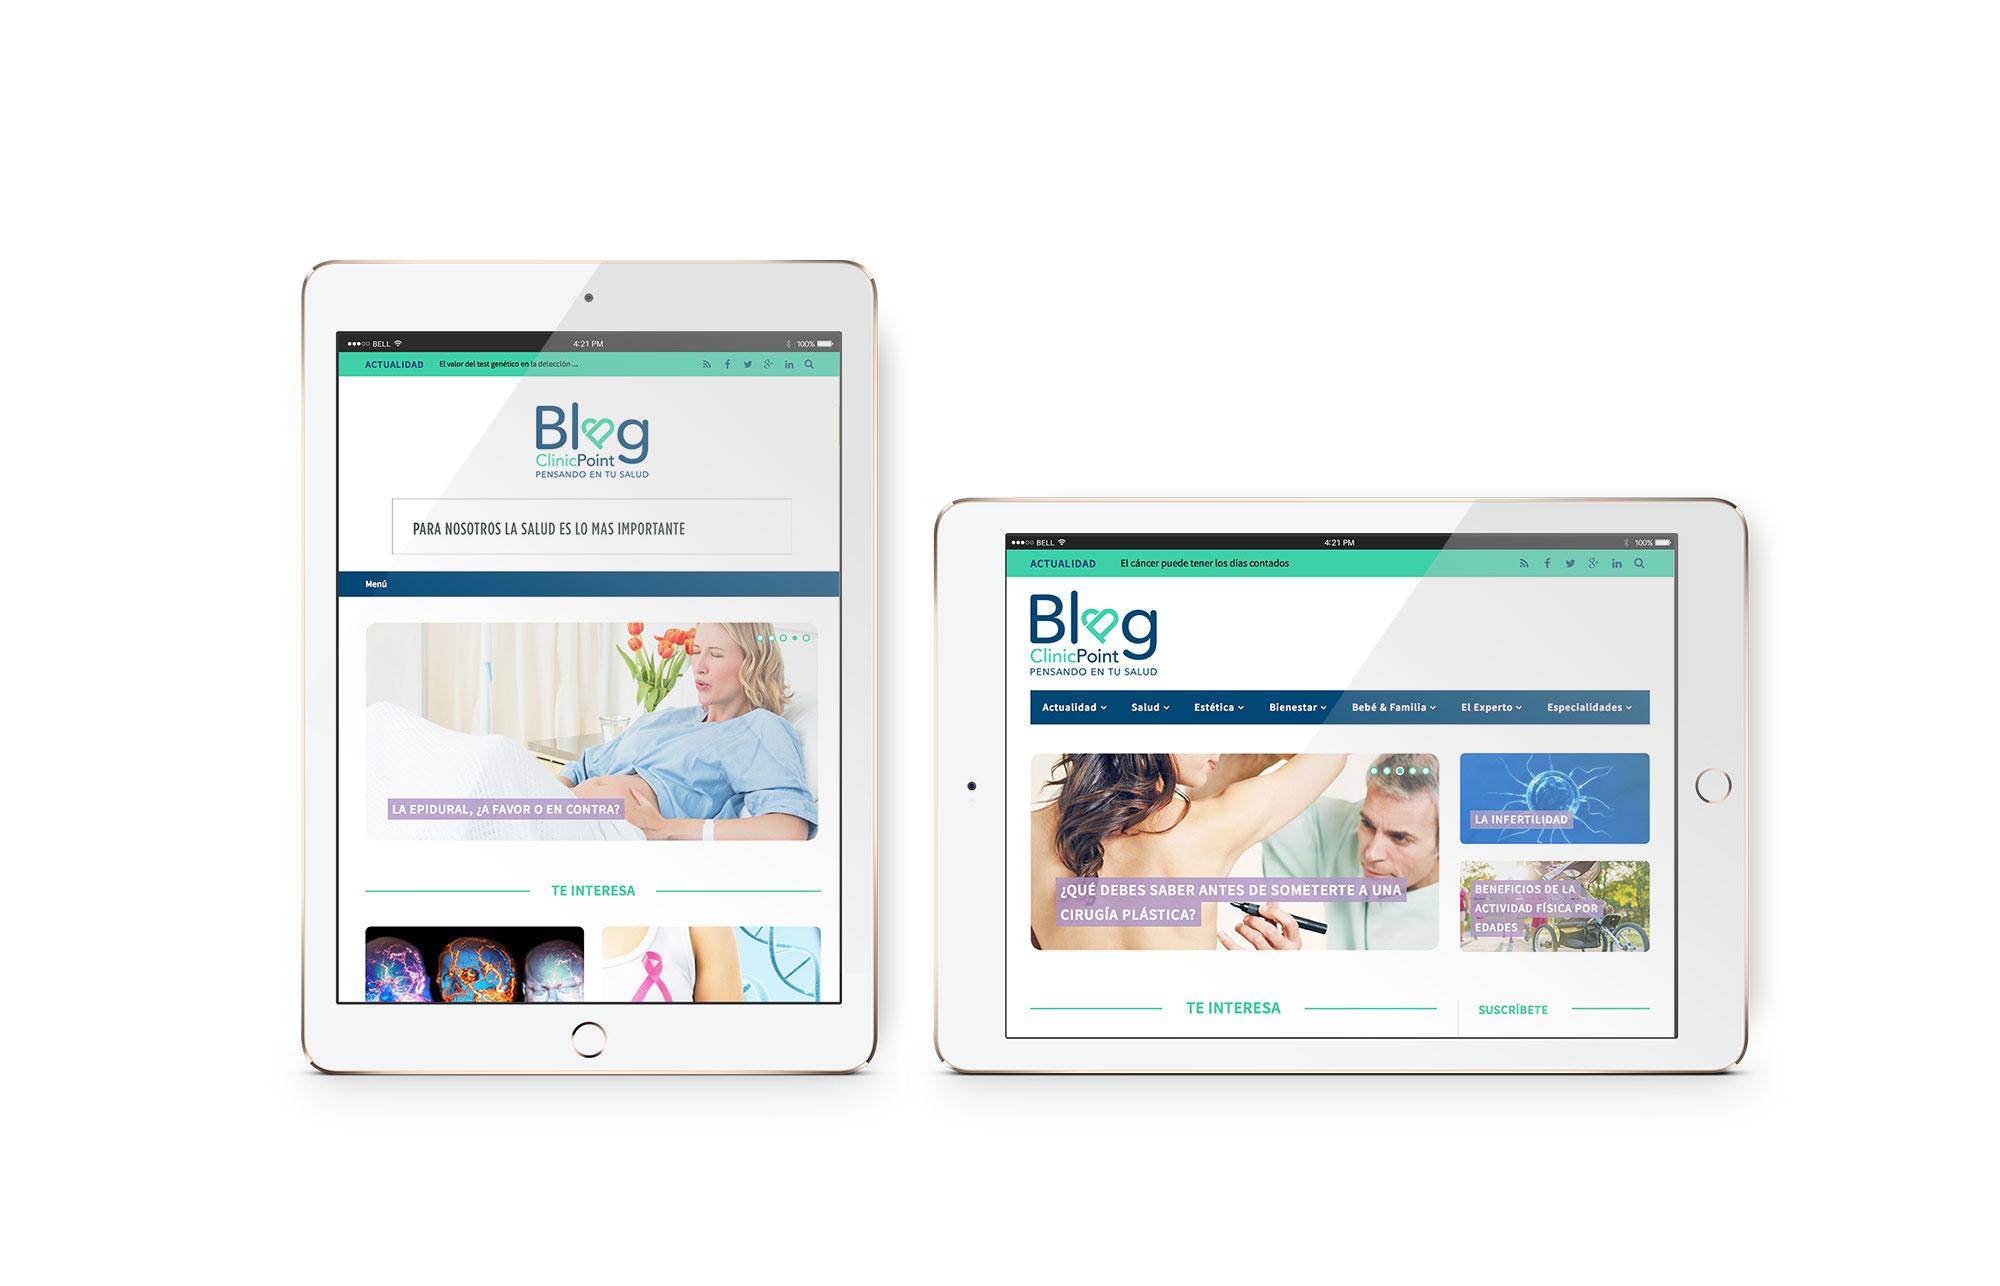 MEDPRIVE-BLOG-iPad-1.jpg